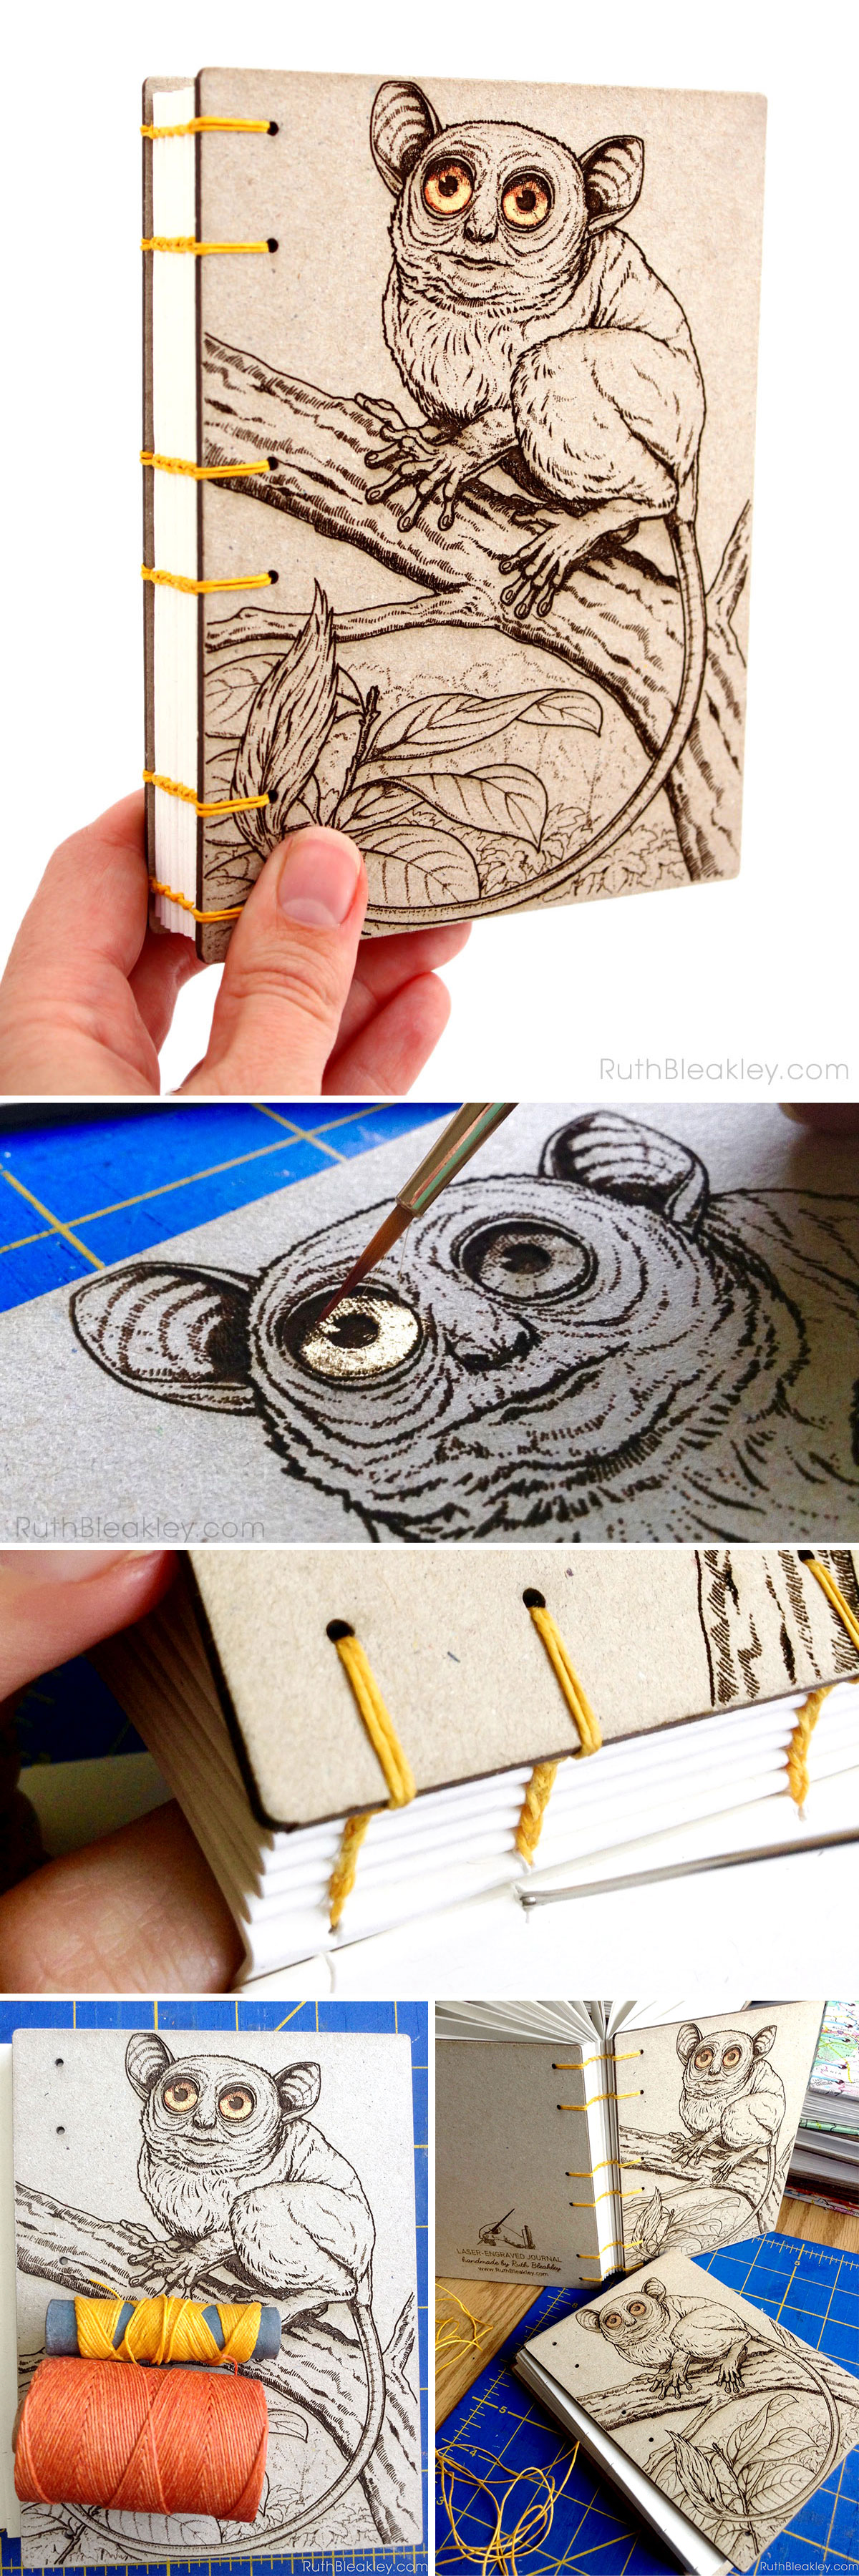 Koboldmaki Tarsier Journal handmade by Ruth Bleakley - reminds me of Yoda